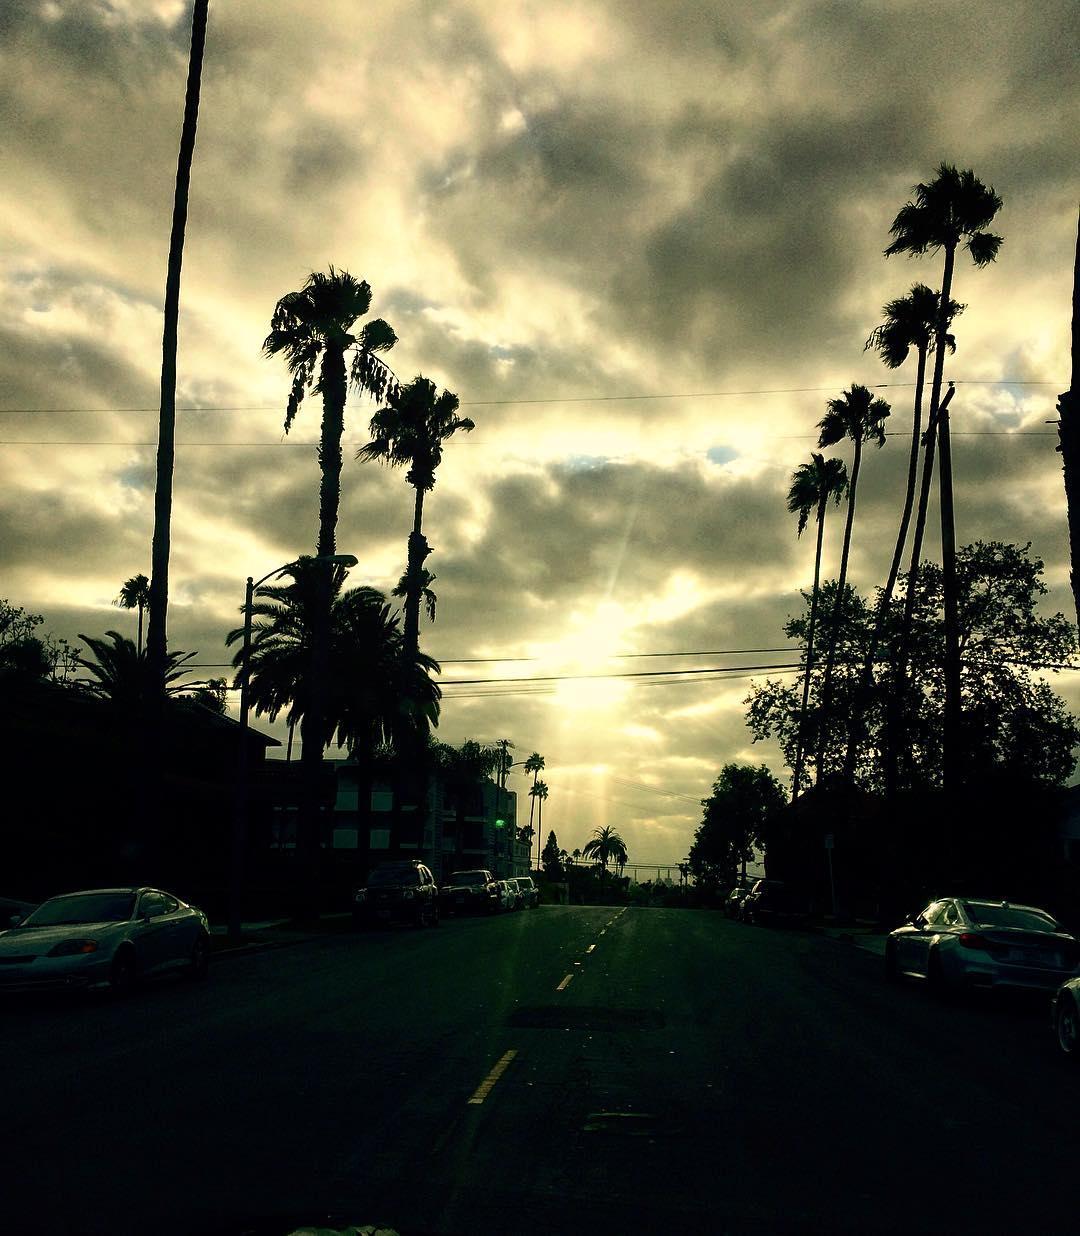 Long Beach, CA looking quintessential California with tropi skies. #LBC